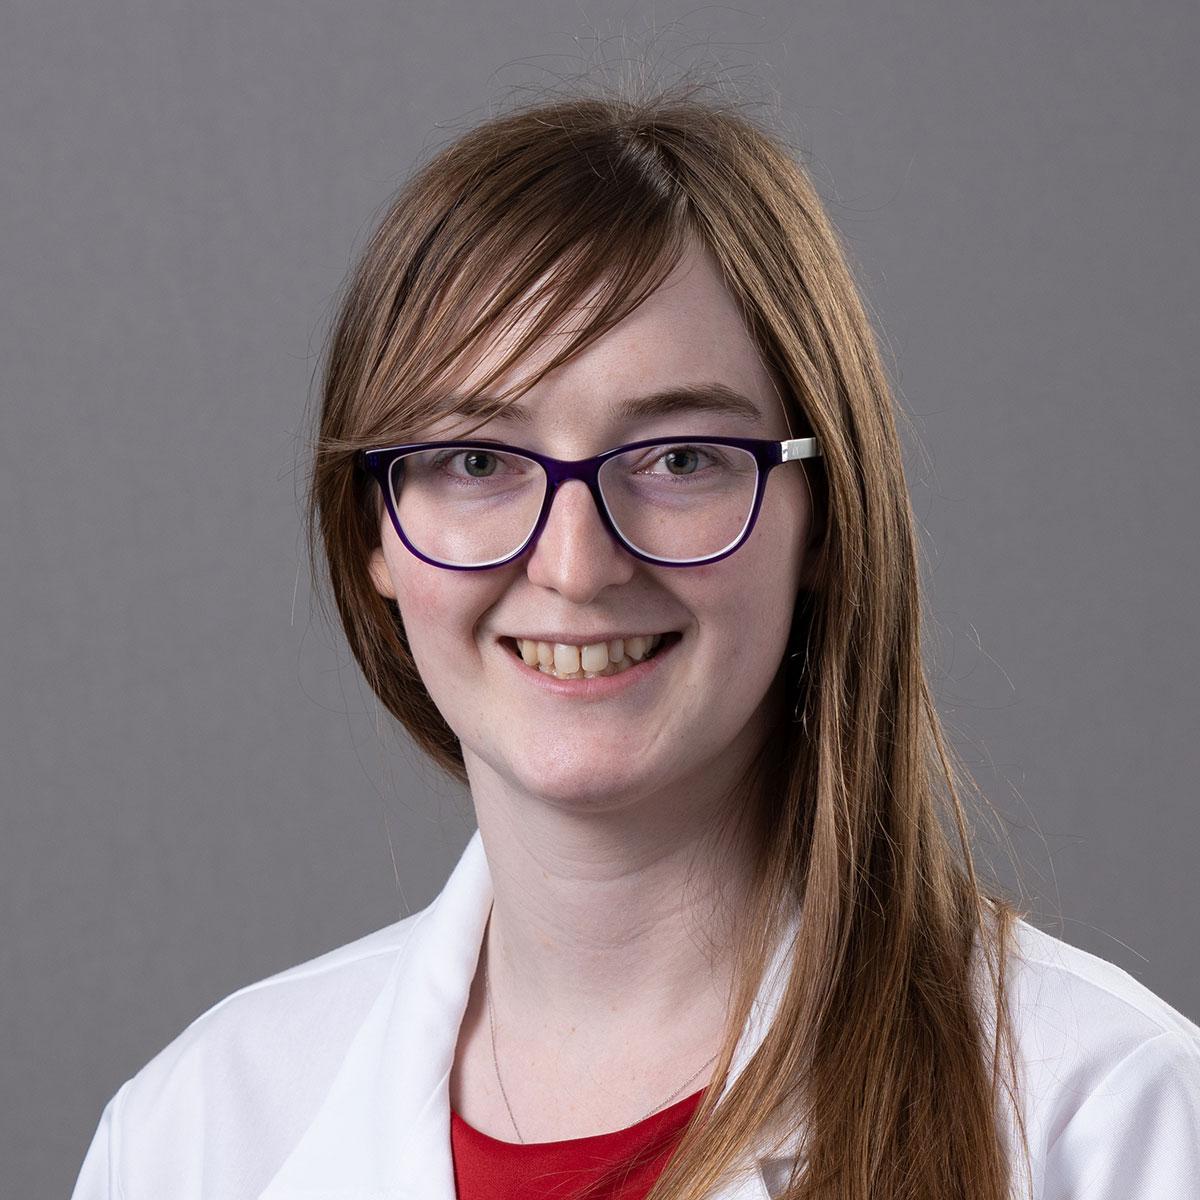 A friendly headshot of Dr. Anita Savell